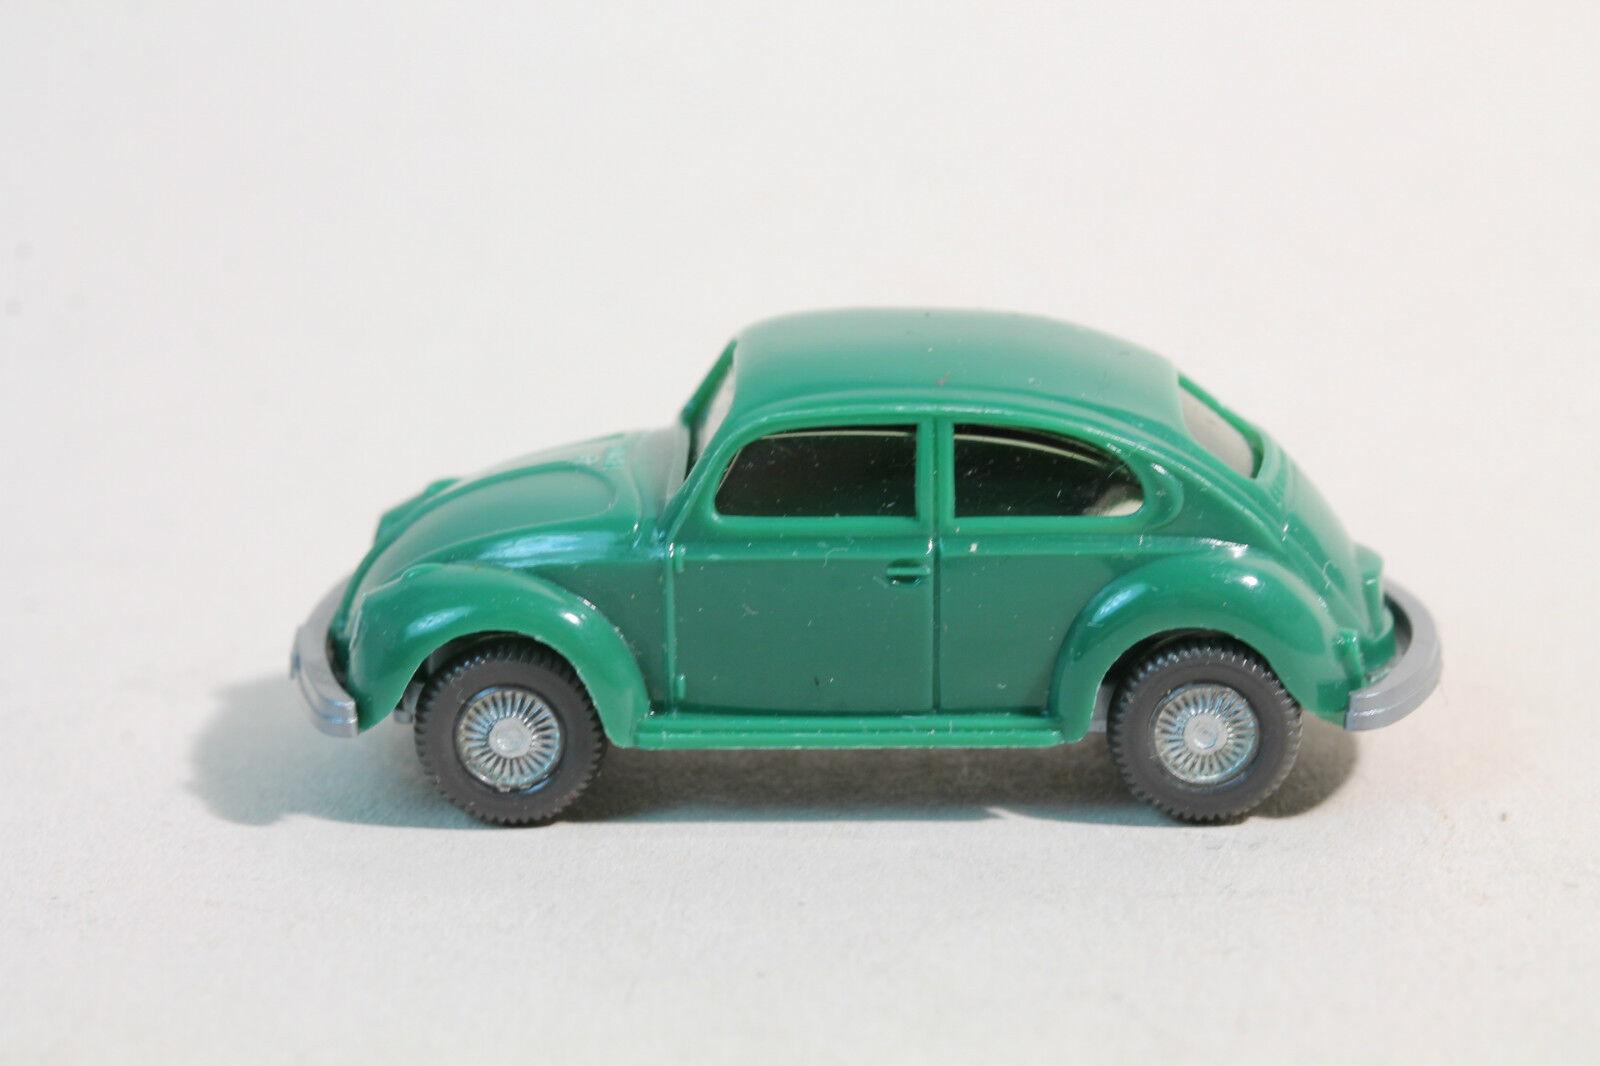 302 Type 3 C Wiking VW Beetle (TYPE 6)  1969 - 1974 diahommetvert  magasin pas cher